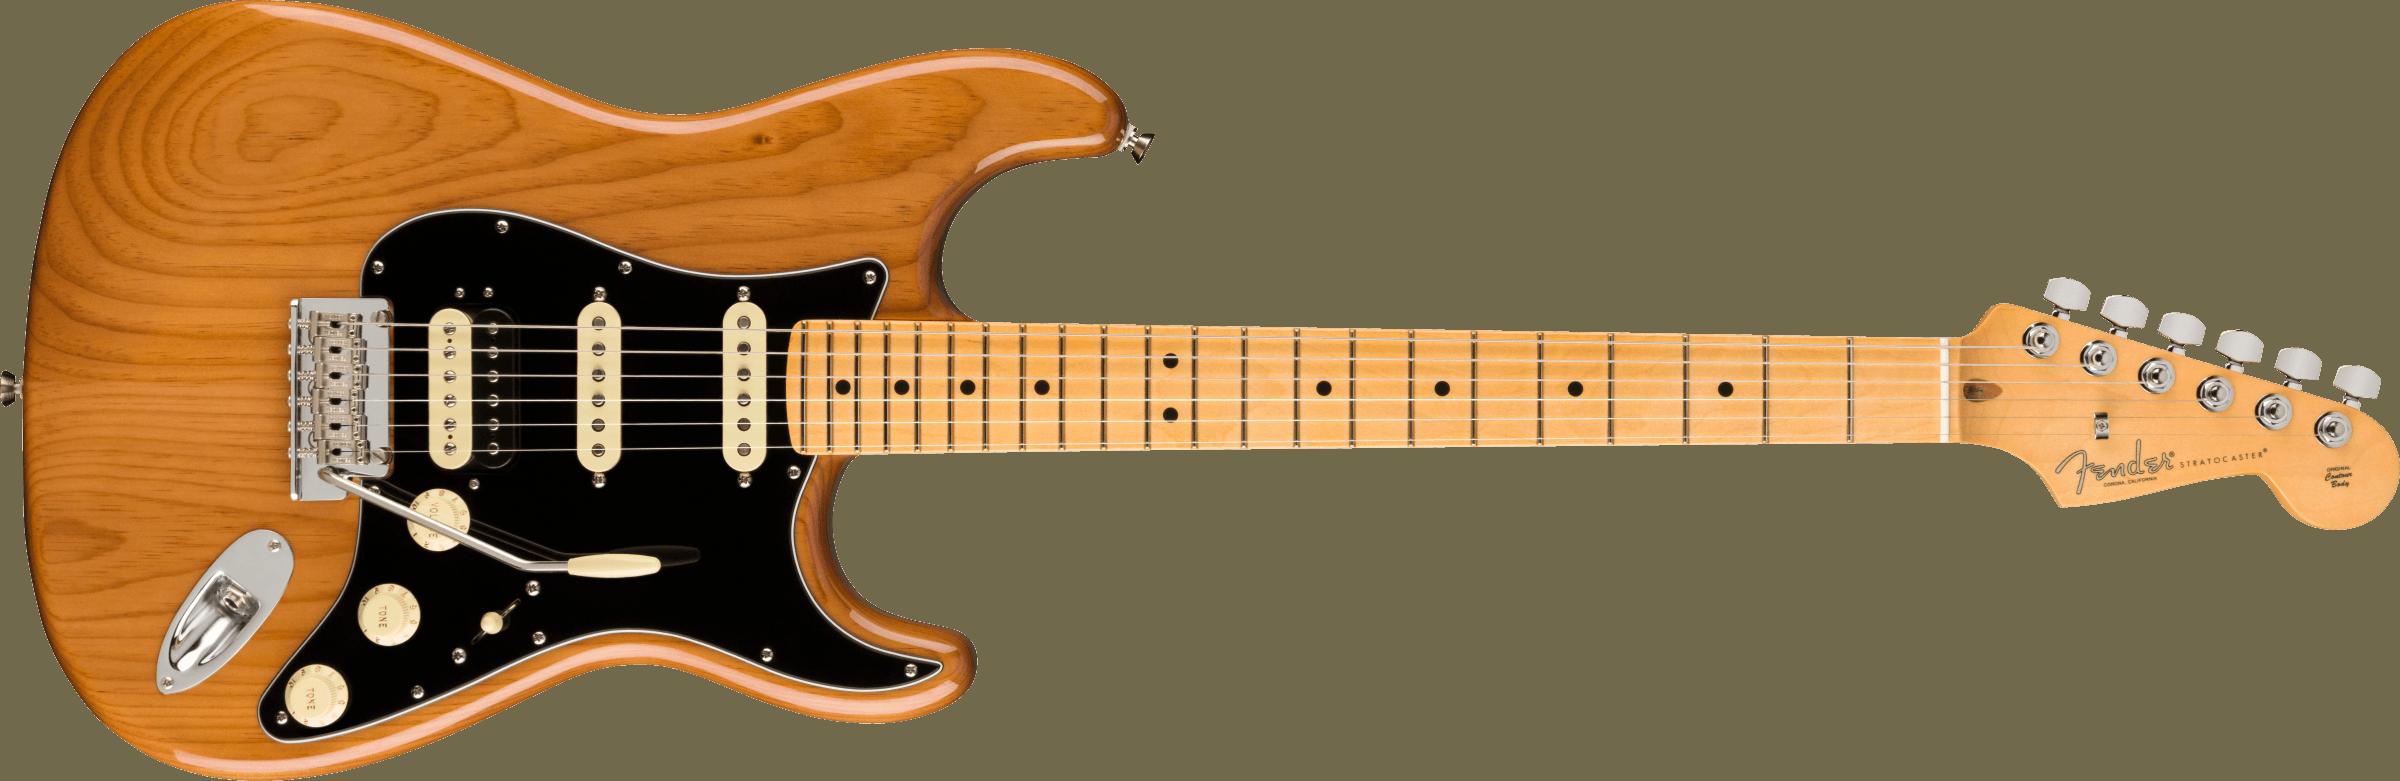 FENDER-American-Professional-II-Stratocaster-HSS-Maple-Fingerboard-Roasted-Pine-sku-571005533